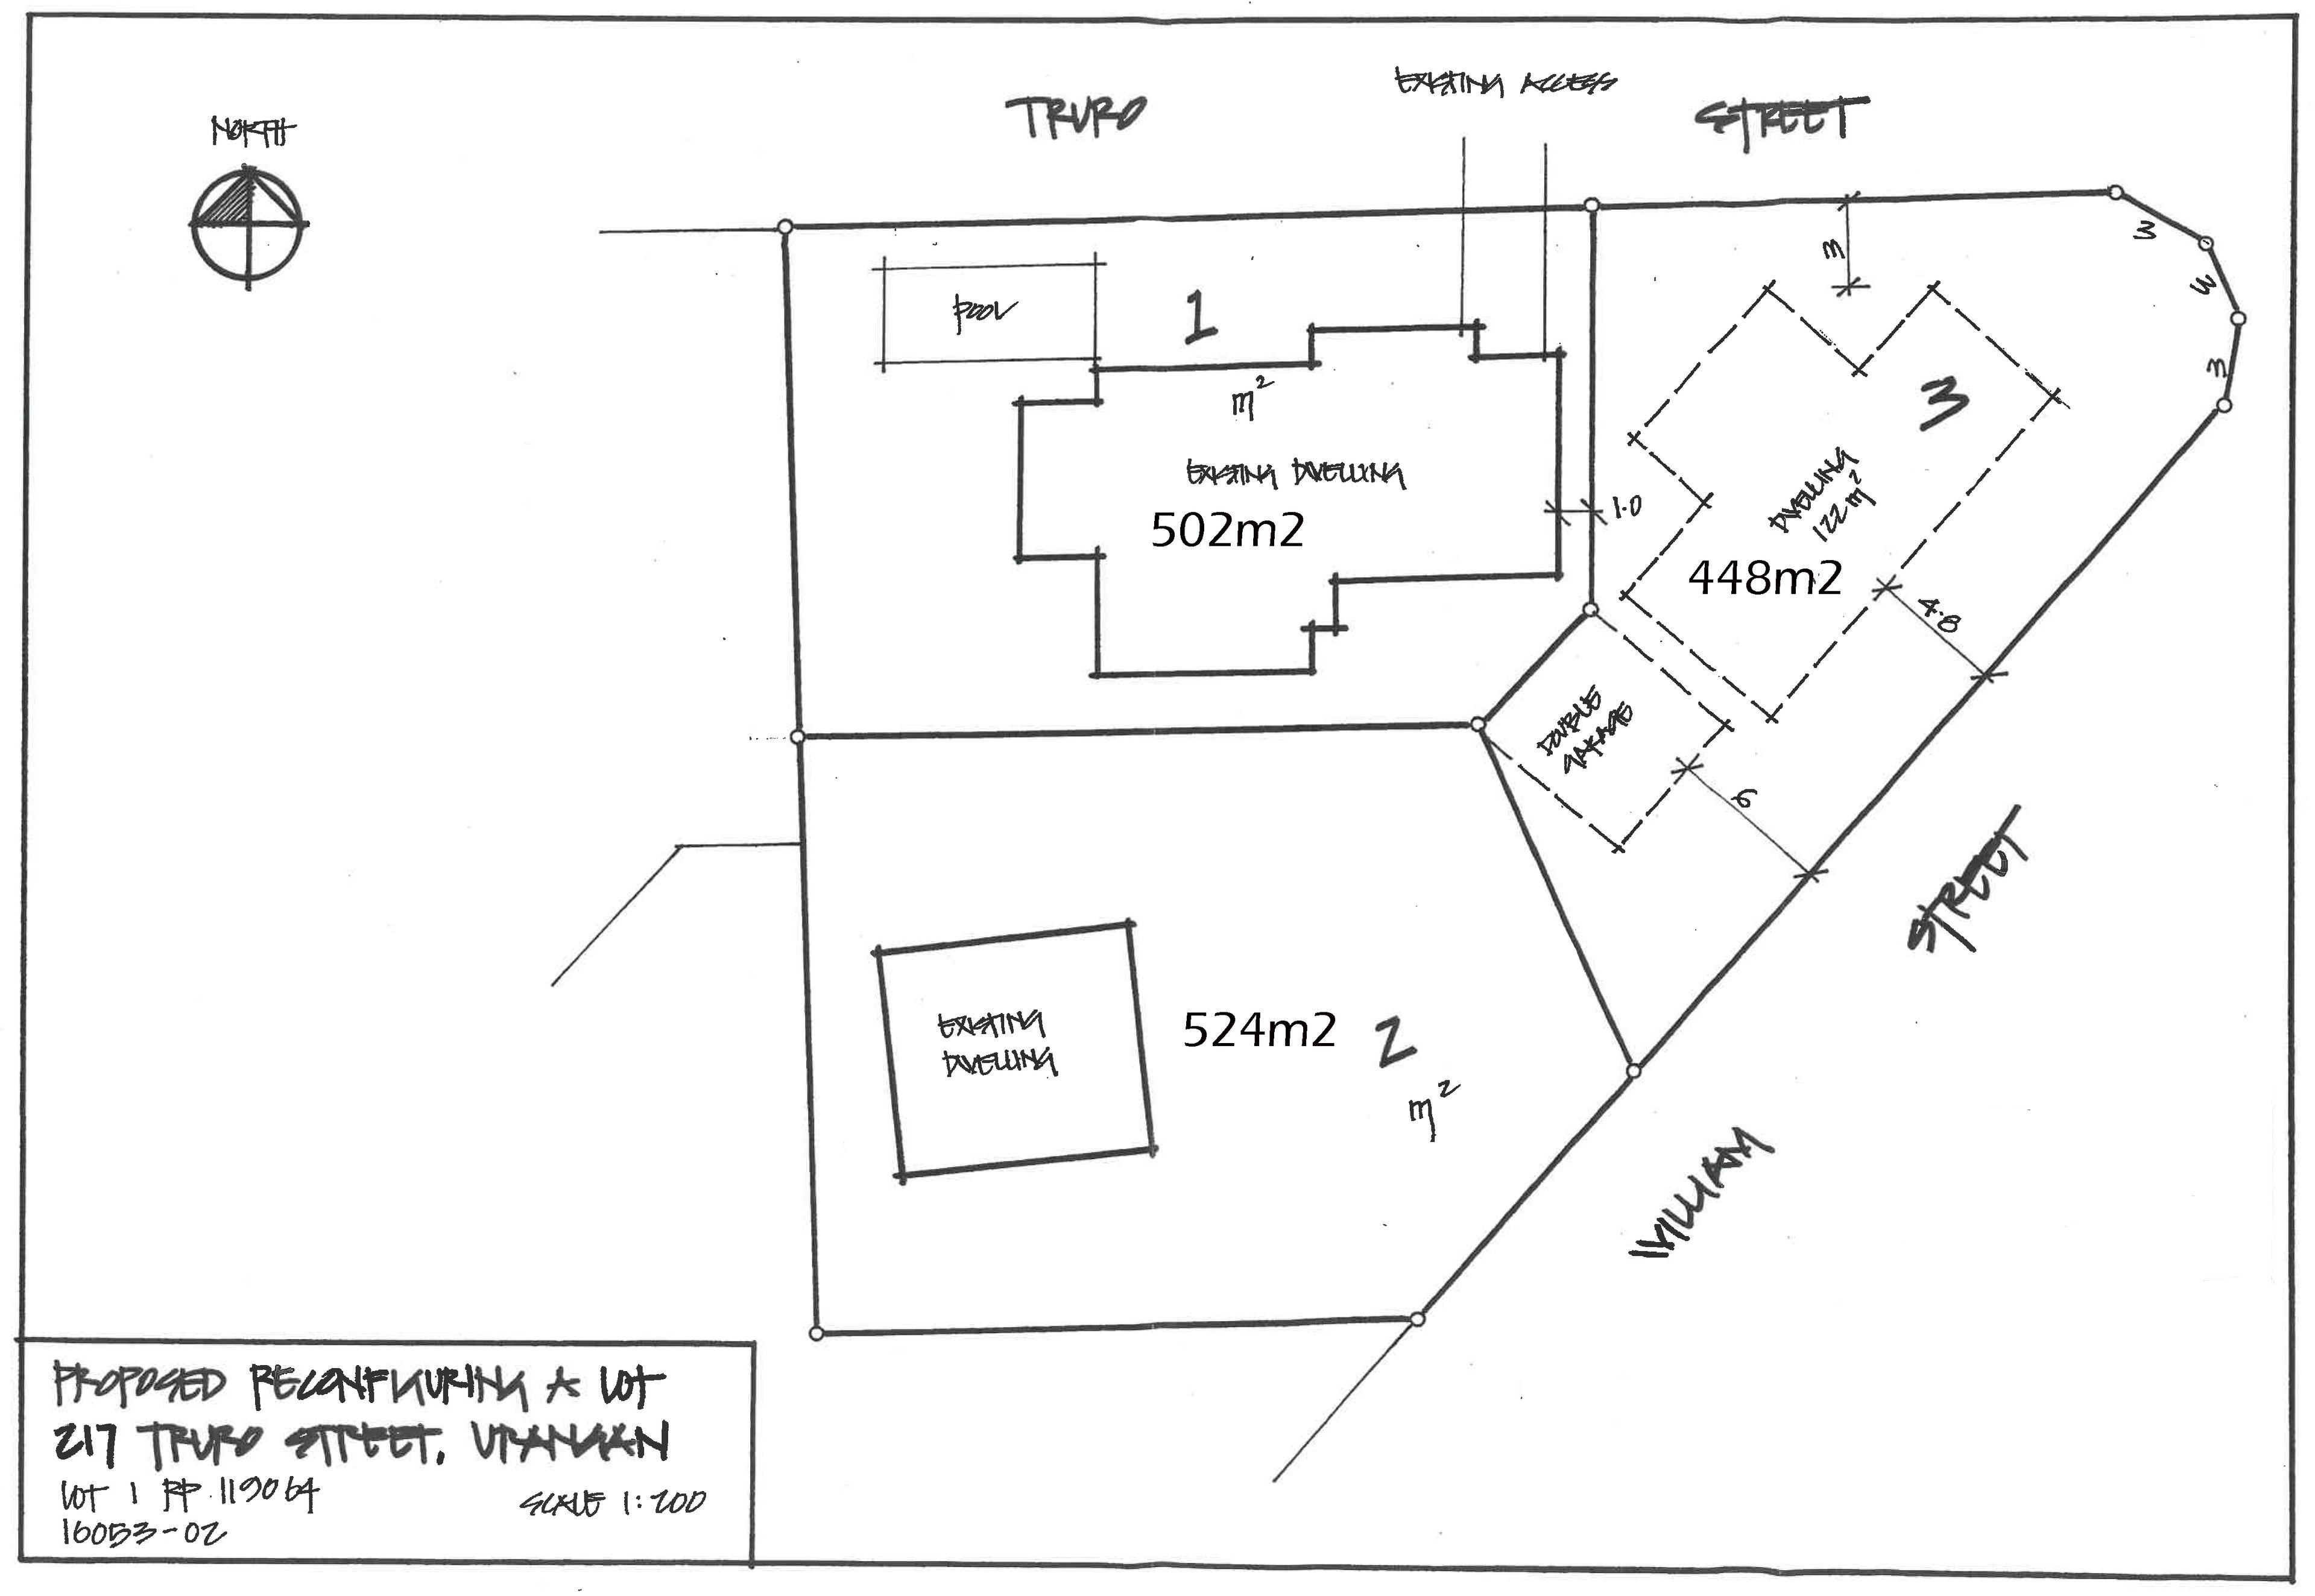 217 Truro Street, Urangan